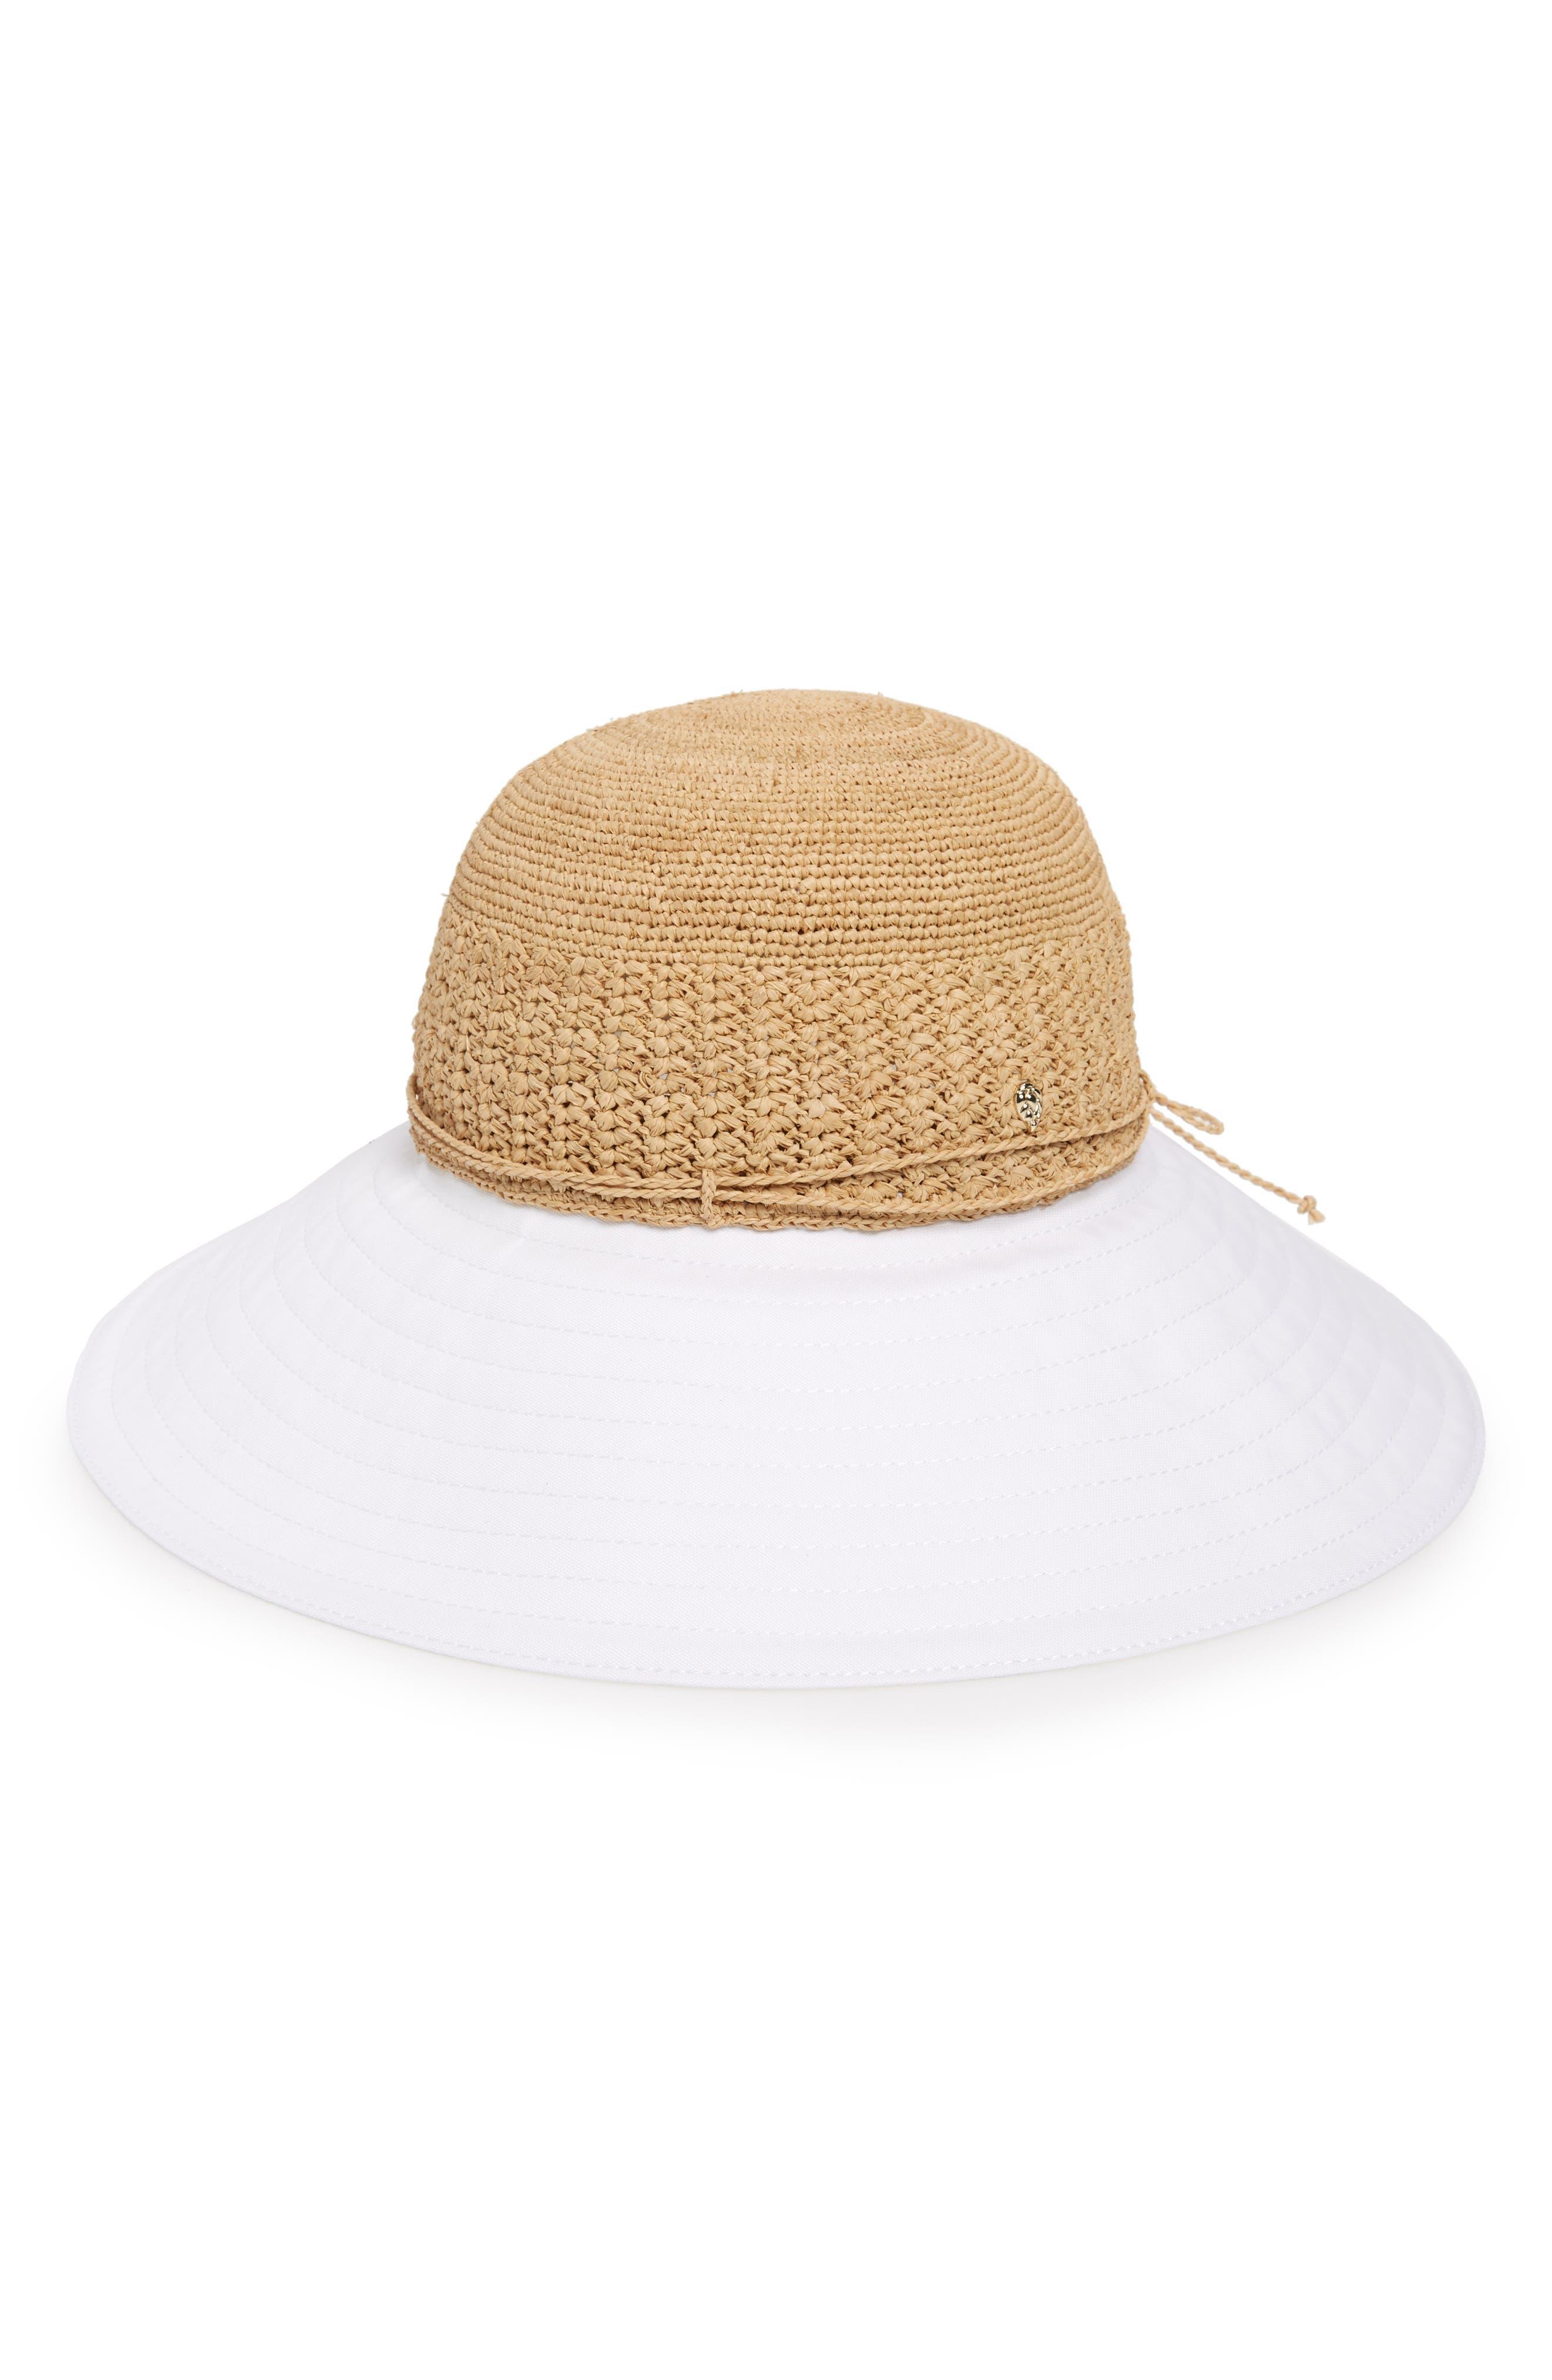 Helen Kaminski Raffia & Cotton Packable Wide Brim Hat